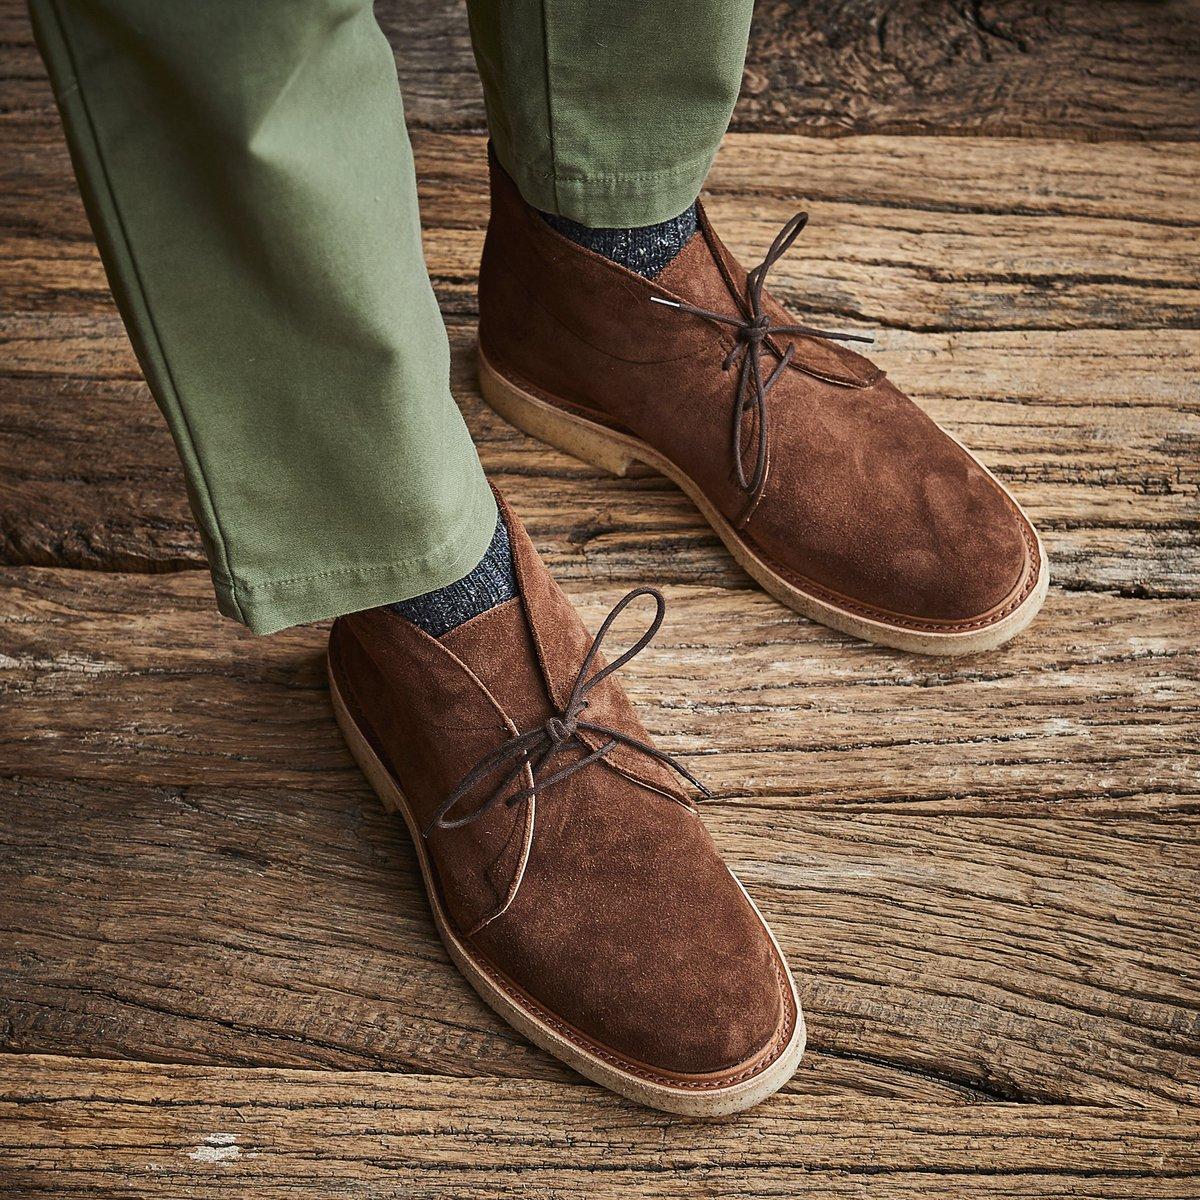 Leo boots in Reverse Kudu suede